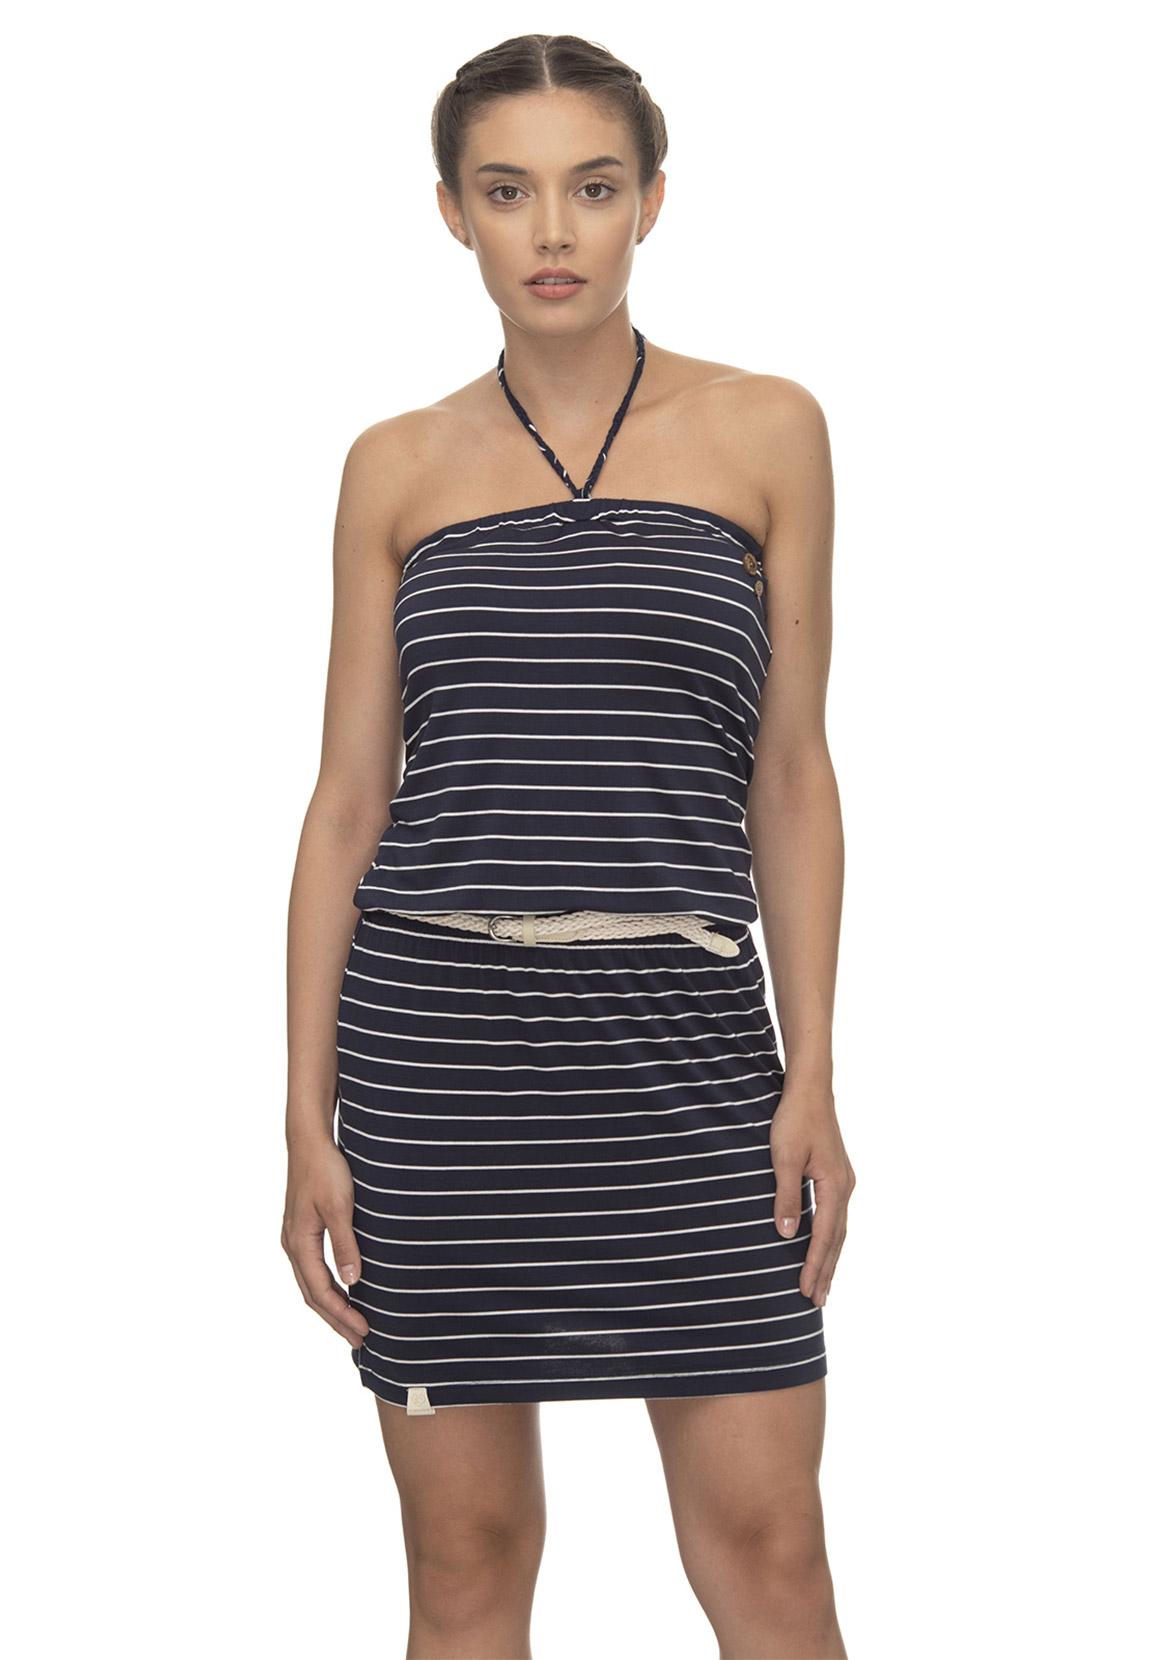 ragwear kleid damen chicka 2011-20001 blau navy 2028 | fashioncode.de  onlineshop